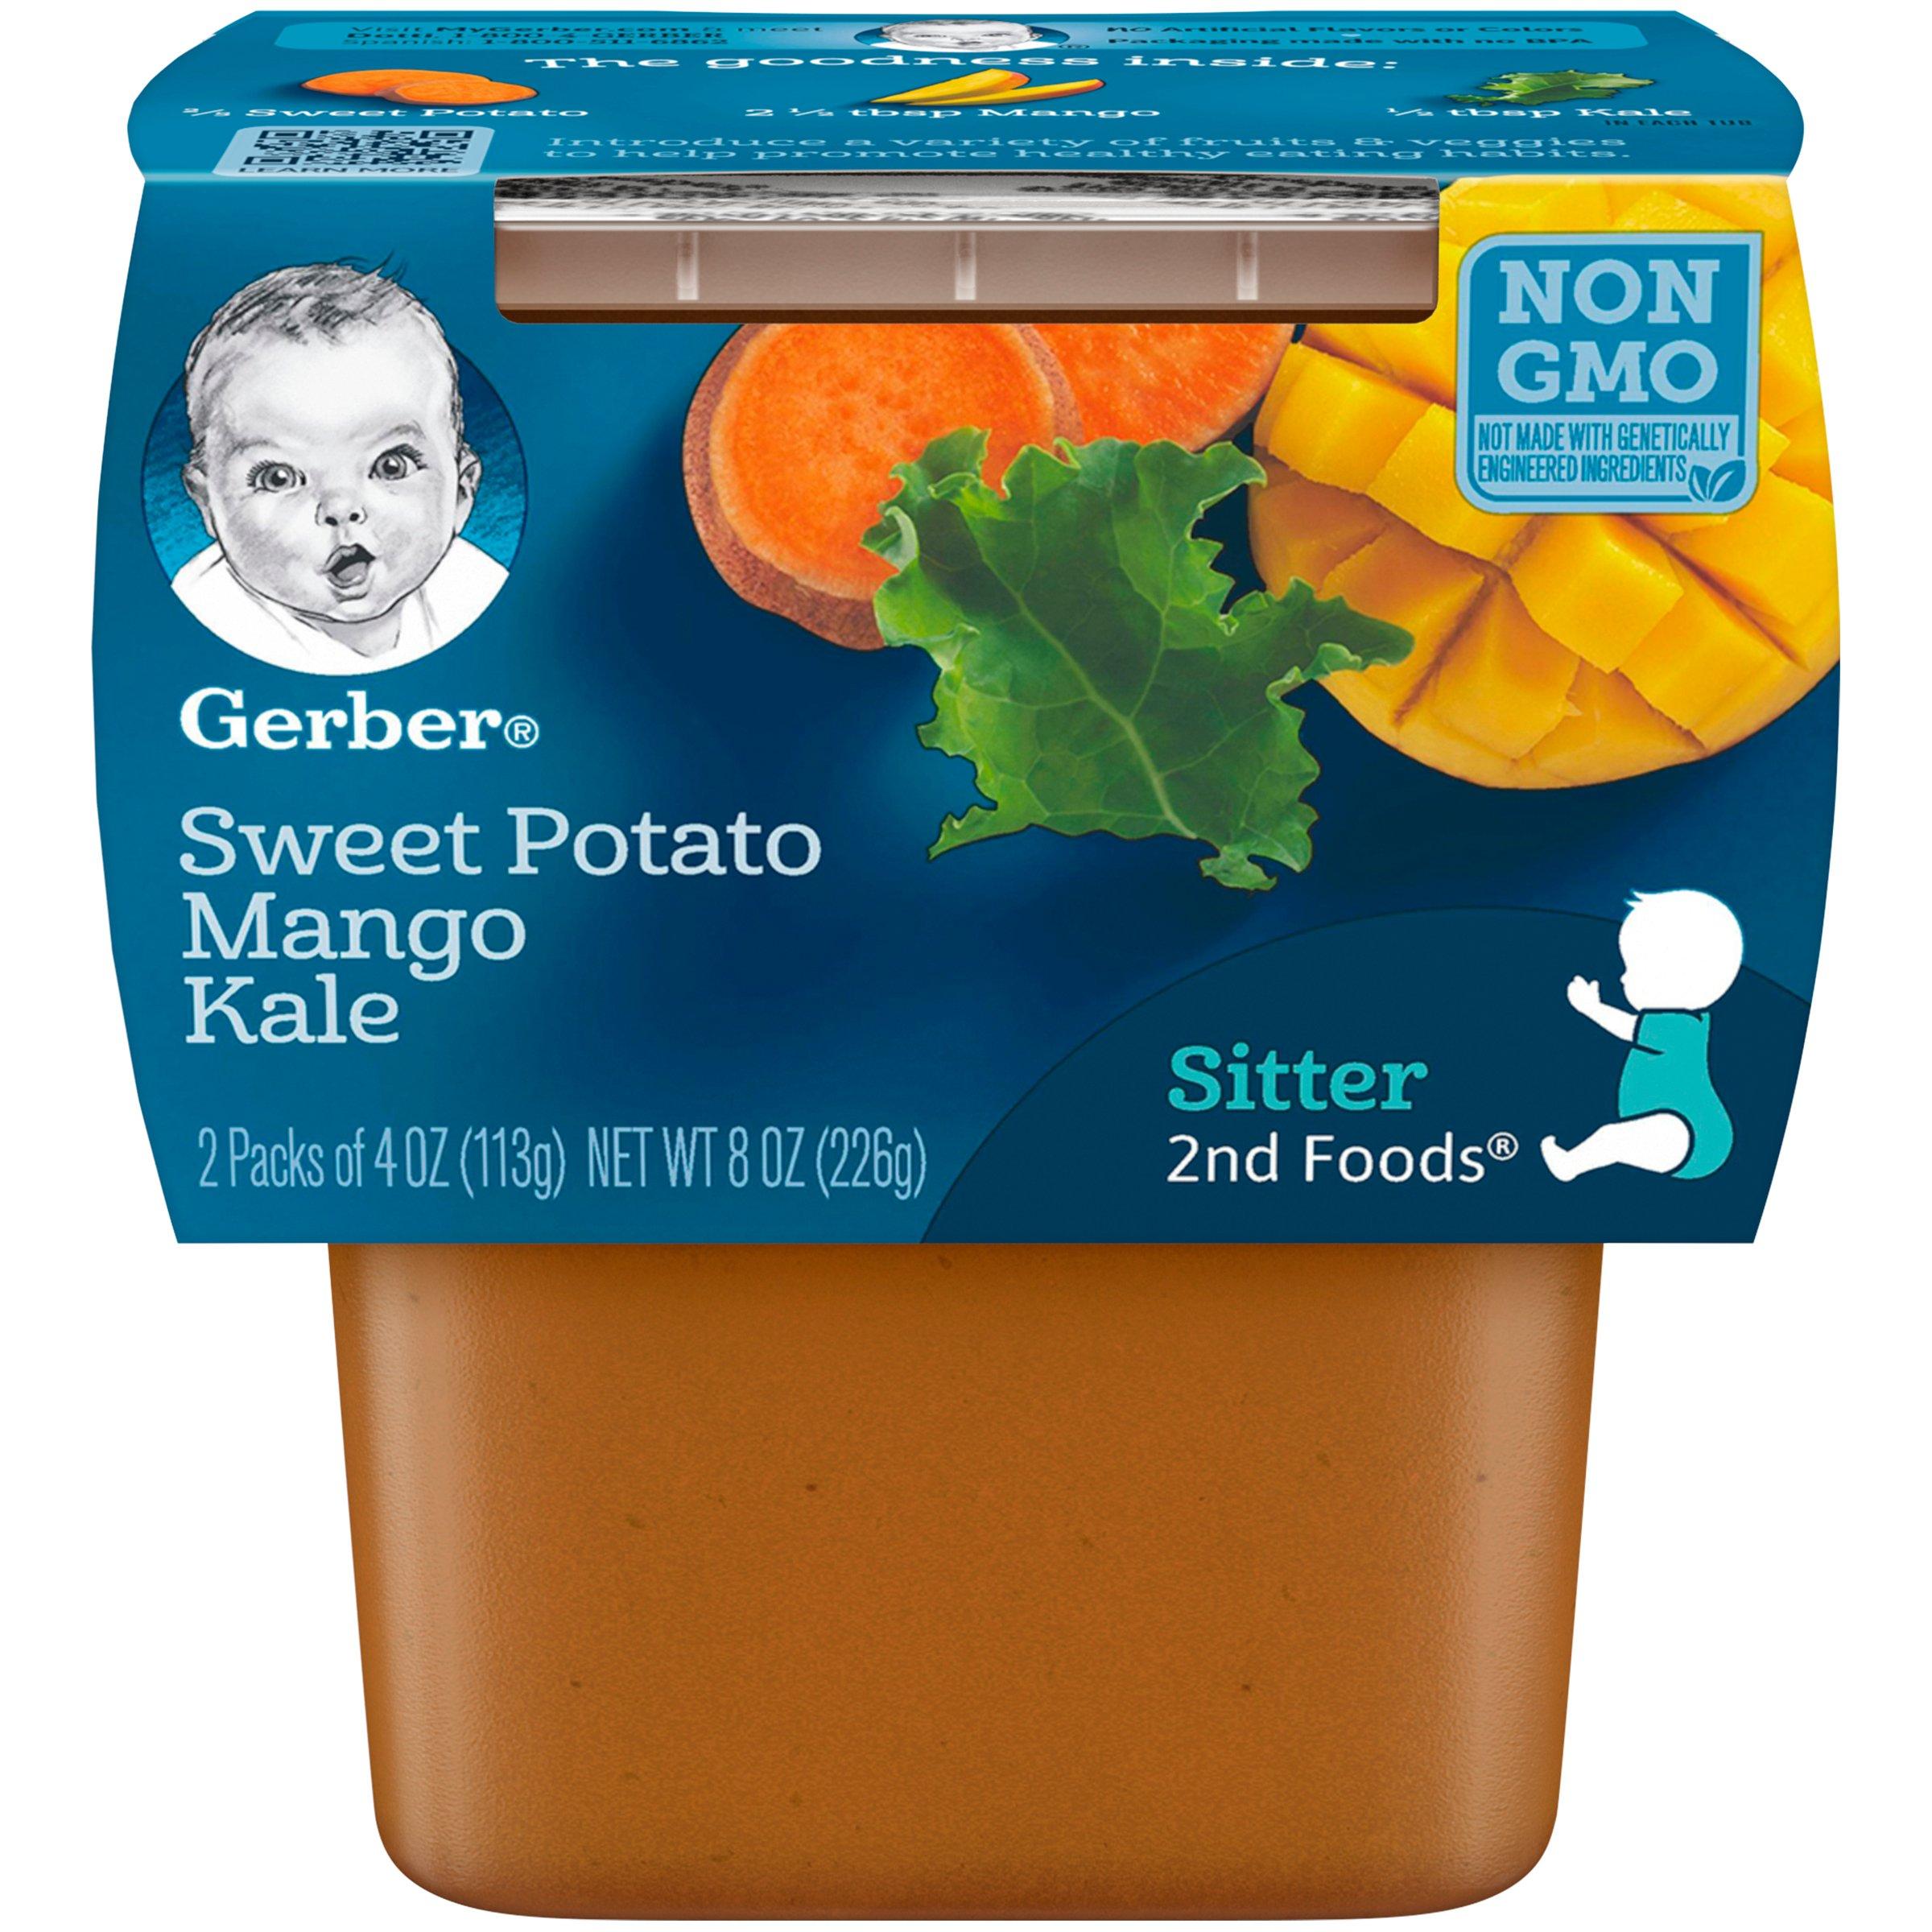 Gerber Purees 2nd Foods Sweet Potato Mango Kale Baby Food Tubs (Pack of 8) by Gerber